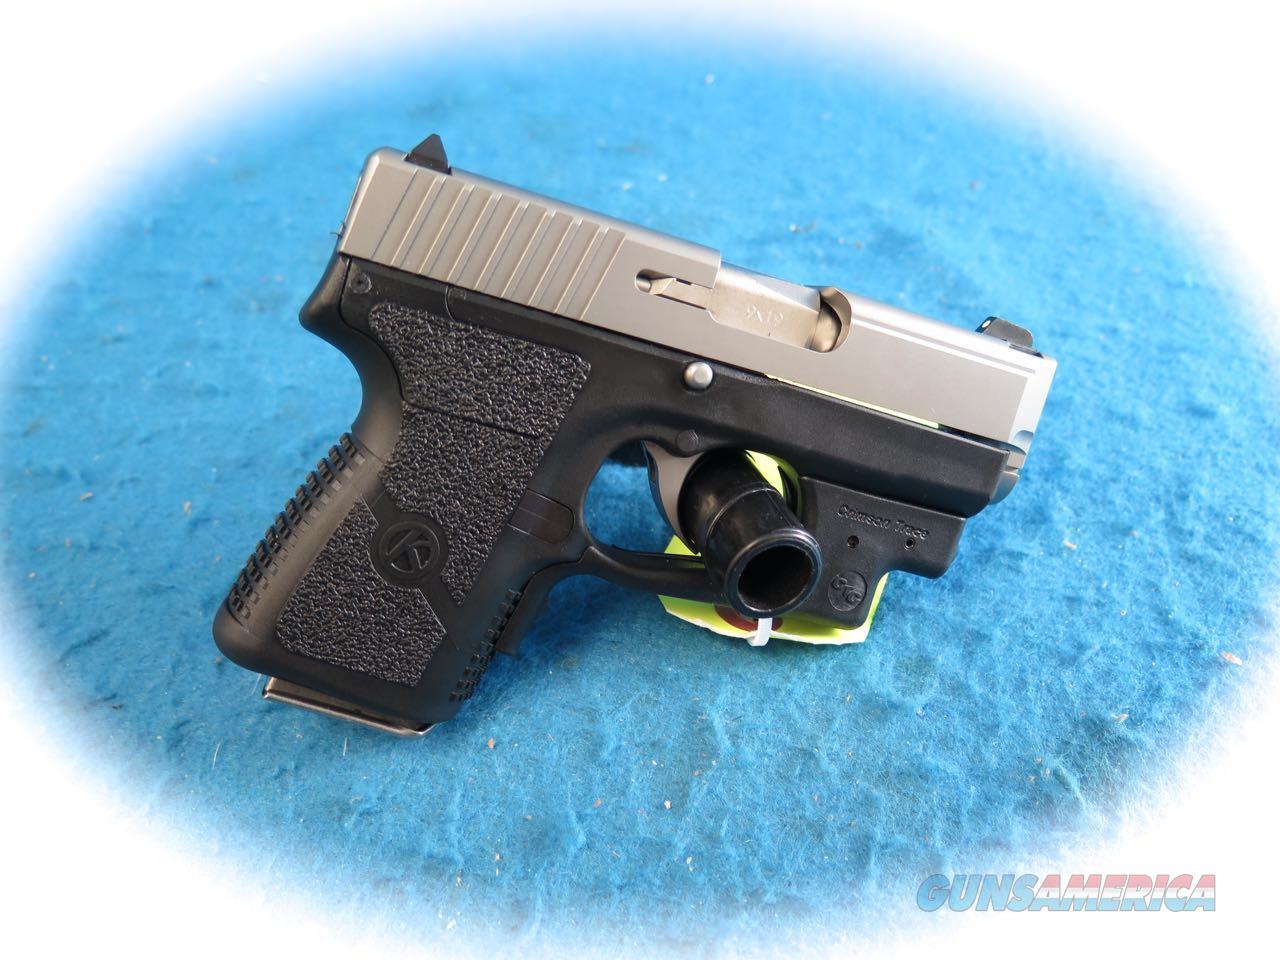 Kahr PM9 9mm Semi Auto Pistol W/CT Laserguard **New**  Guns > Pistols > Kahr Pistols